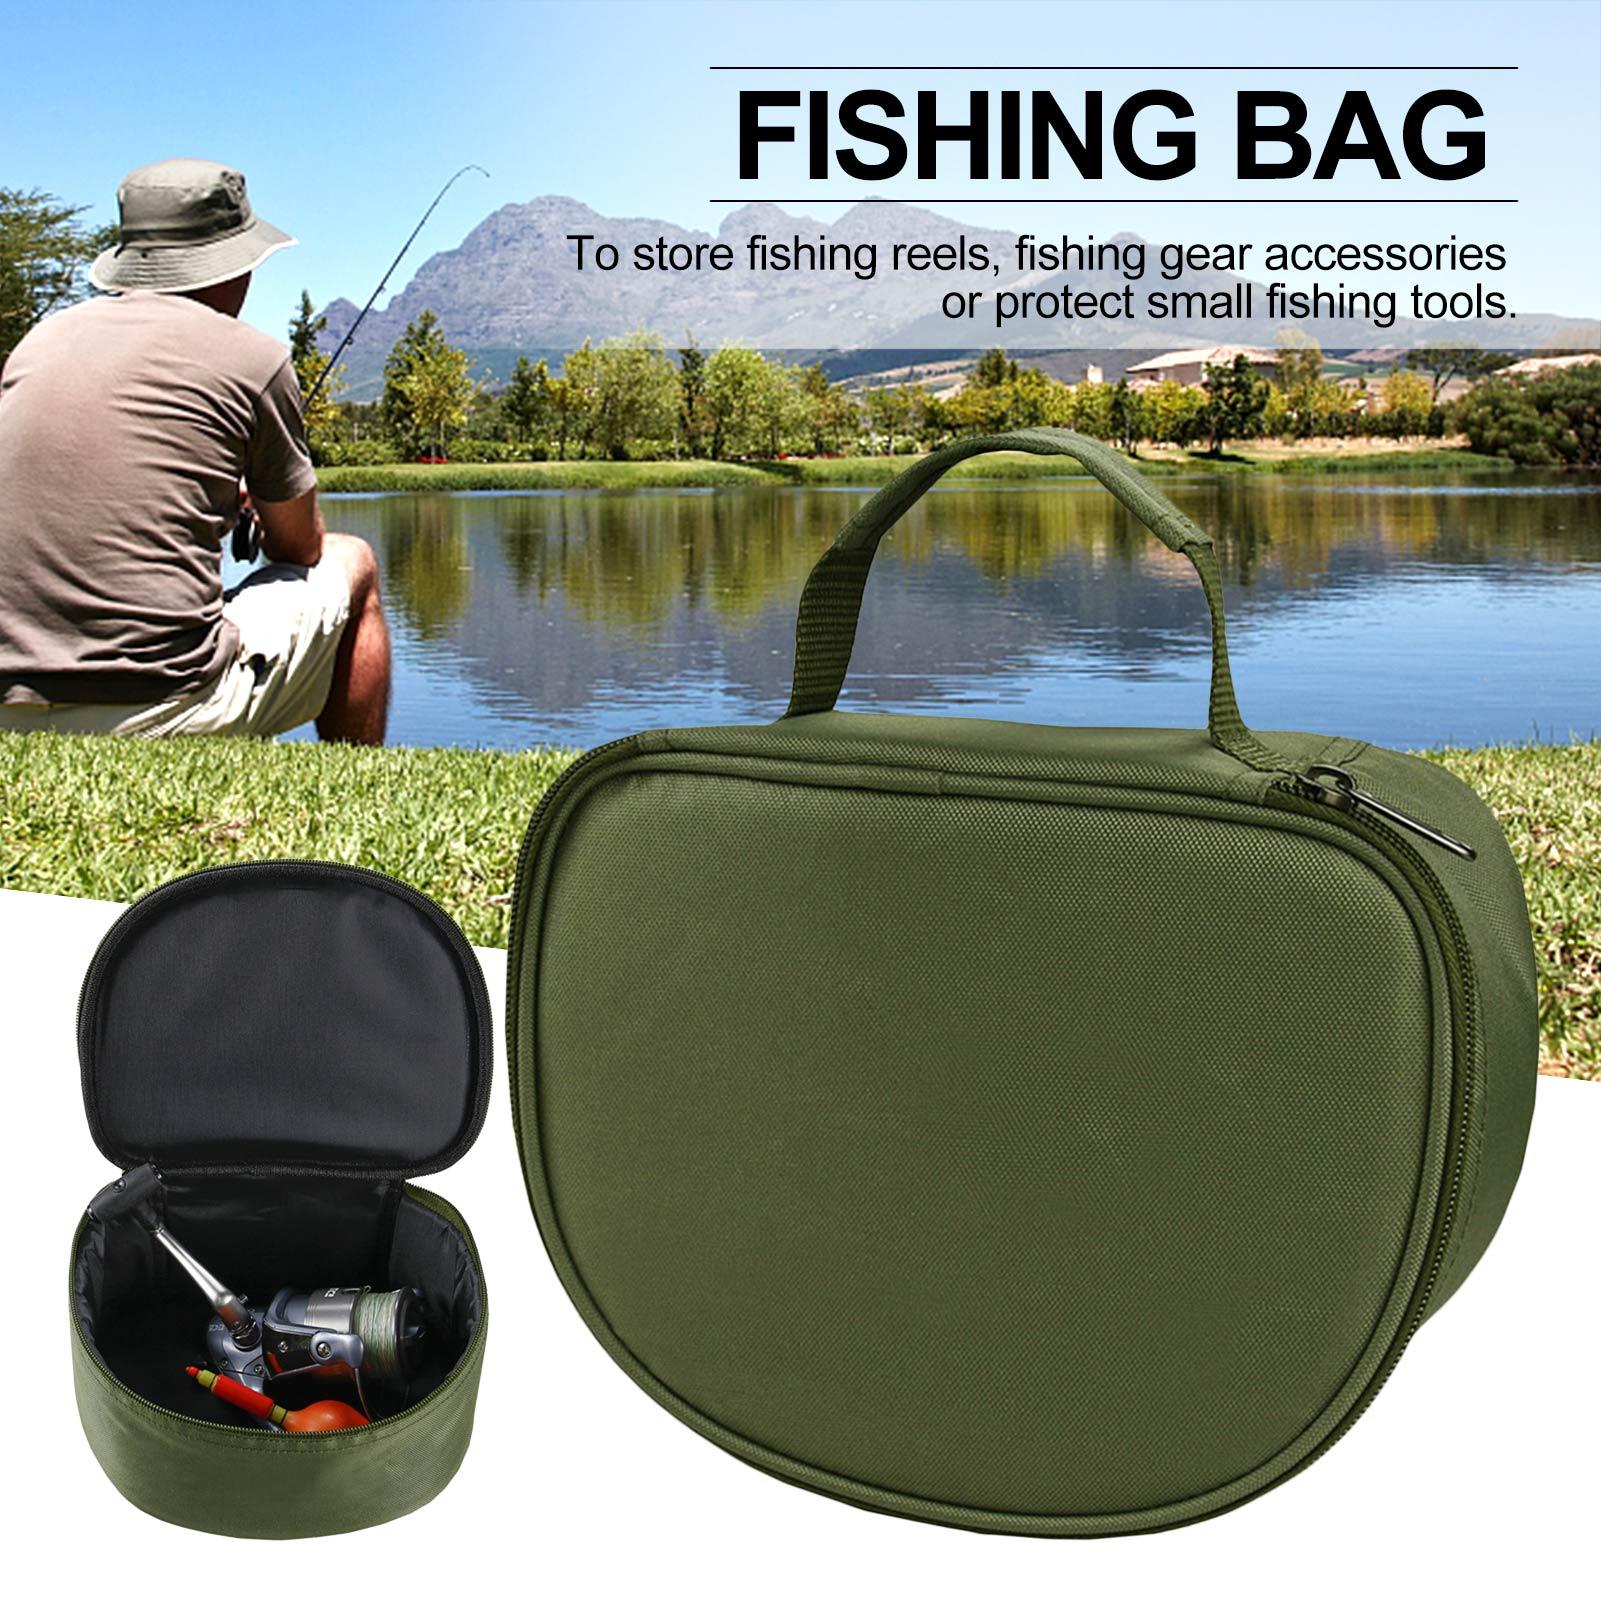 Portable Fishing Bag Fishing Reel Bag Oxford Internal Sponge Protection Fish Tools Bag Used For To Store Fishing Reels Tool